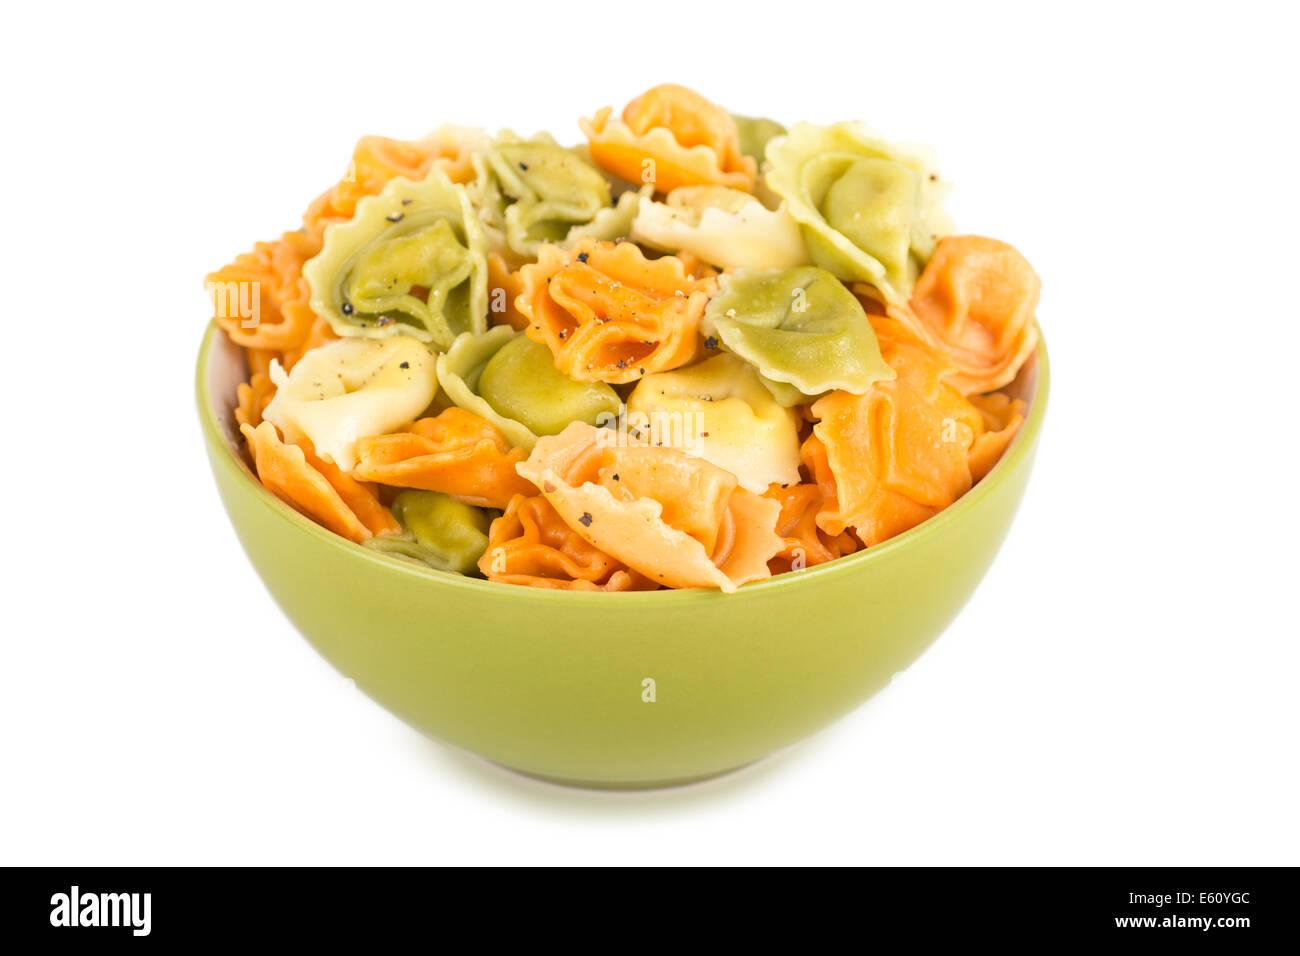 Bowl of Tortellini, Tortellini, Tricolor, Tricolore Pasta - Stock Image